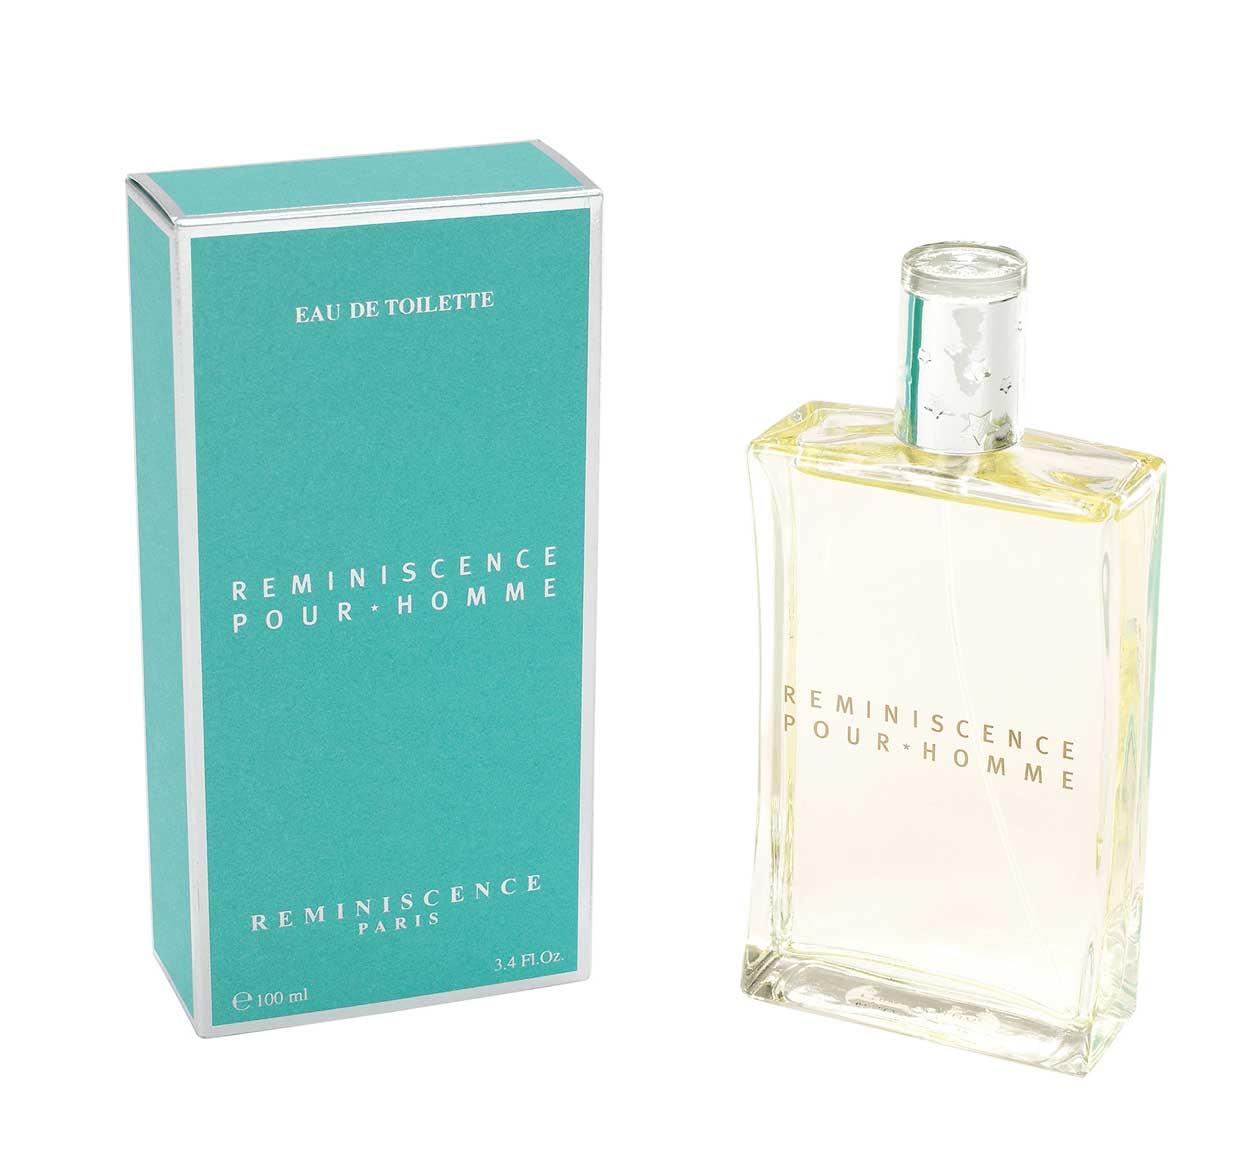 reminiscence pour homme reminiscence cologne a fragrance for men 1999. Black Bedroom Furniture Sets. Home Design Ideas